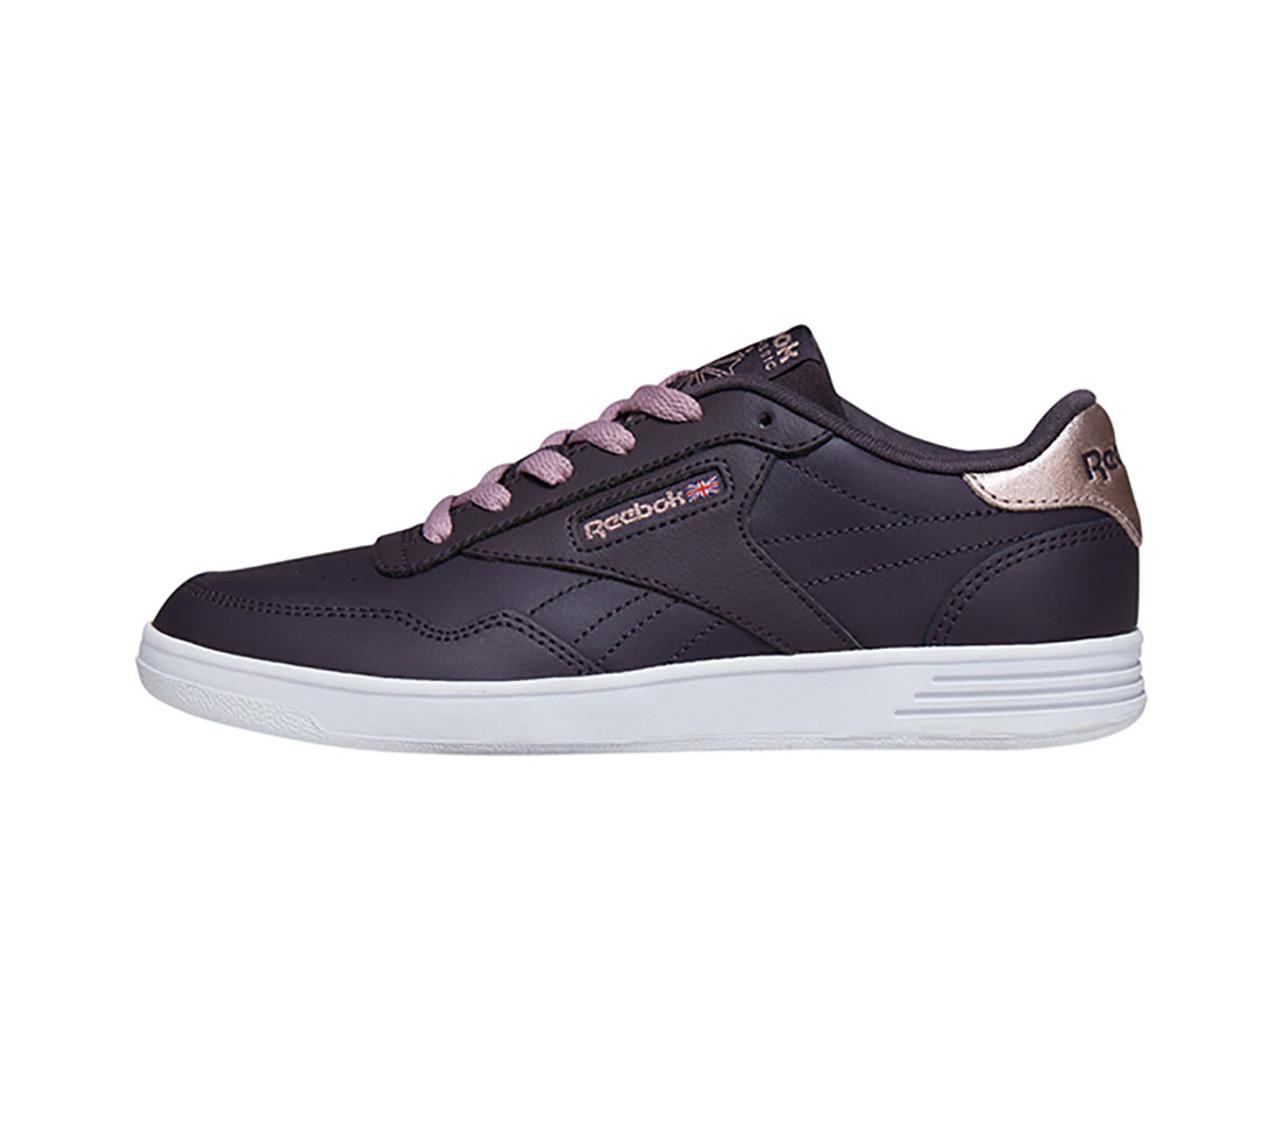 (DRIFTIUMRIDE-BBPB) Reebok Driftium Ride Women s Healthcare Professional Athletic  Footwear ... eeadaf1ea